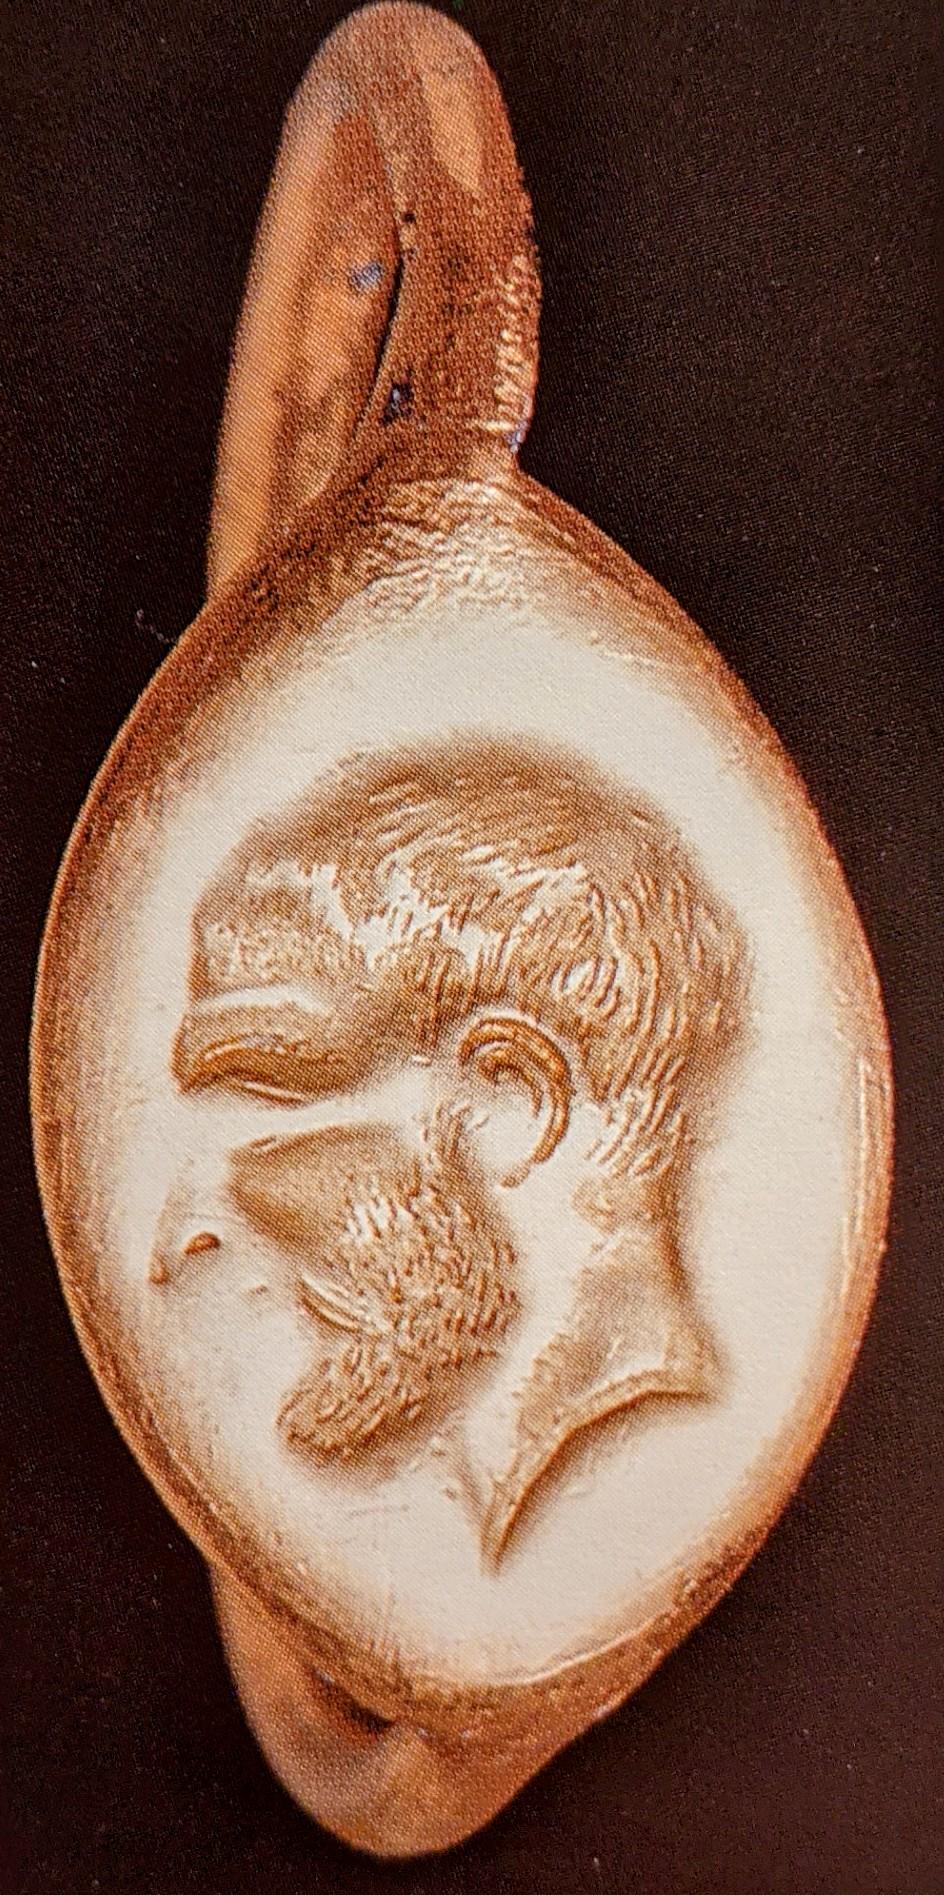 Gold ring bearded man